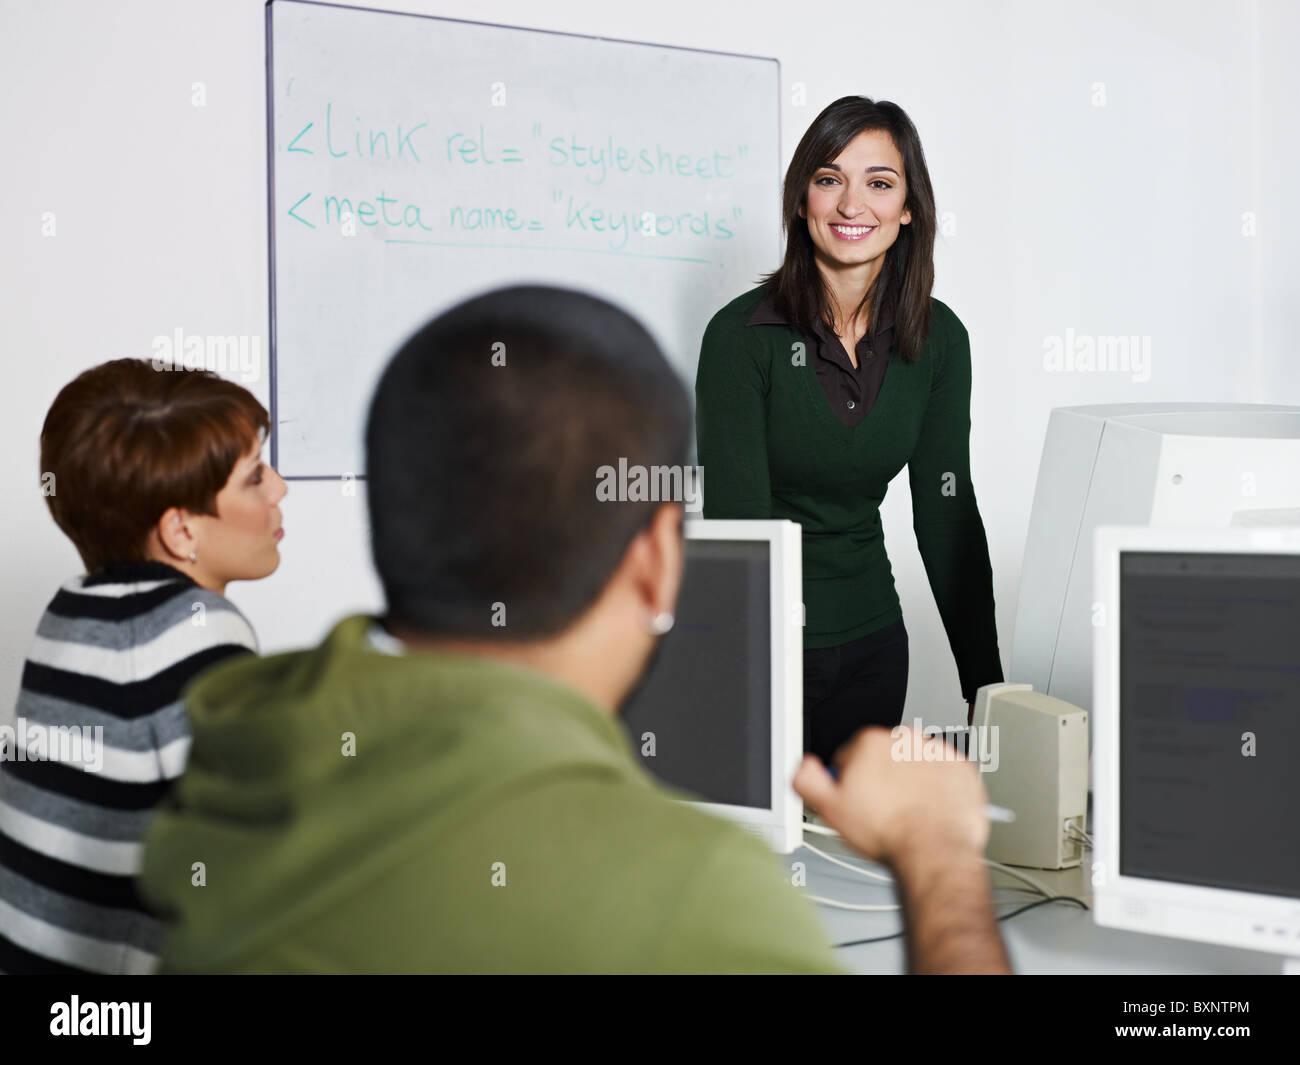 Computer class with caucasian female teacher talking to hispanic student. Horizontal shape, focus on background - Stock Image